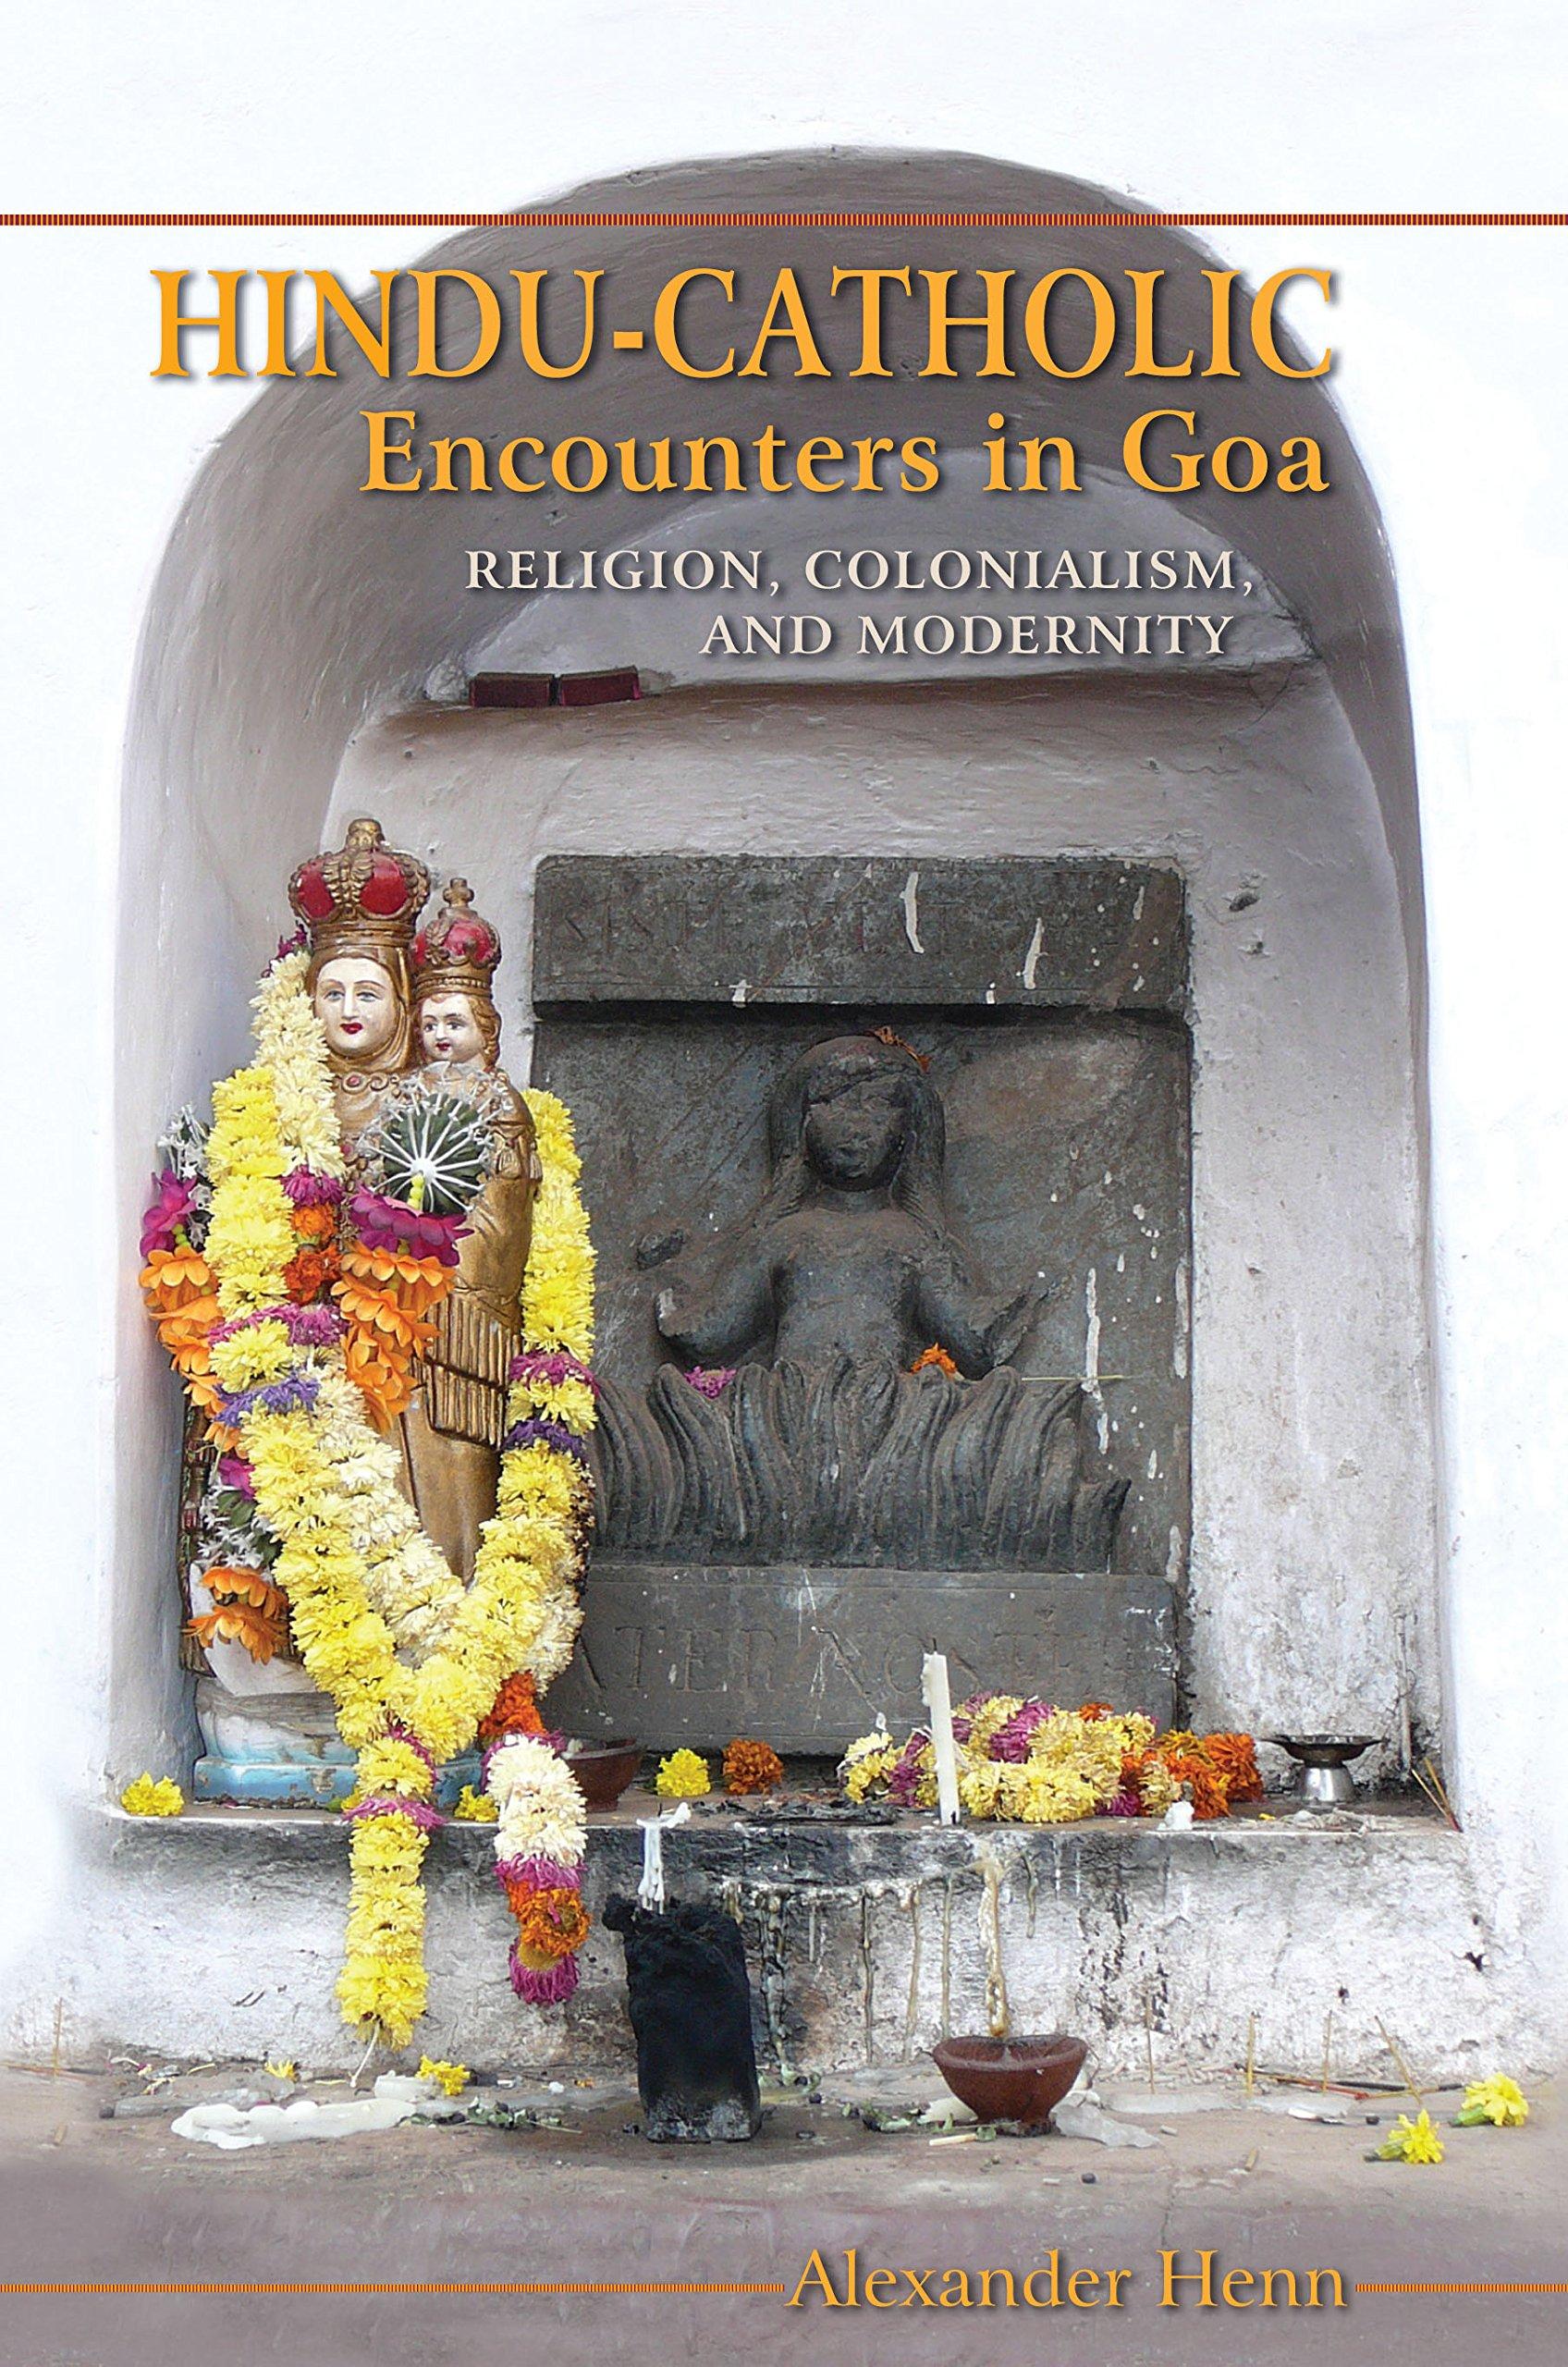 Hindu-Catholic Encounters in Goa: Religion, Colonialism, and Modernity